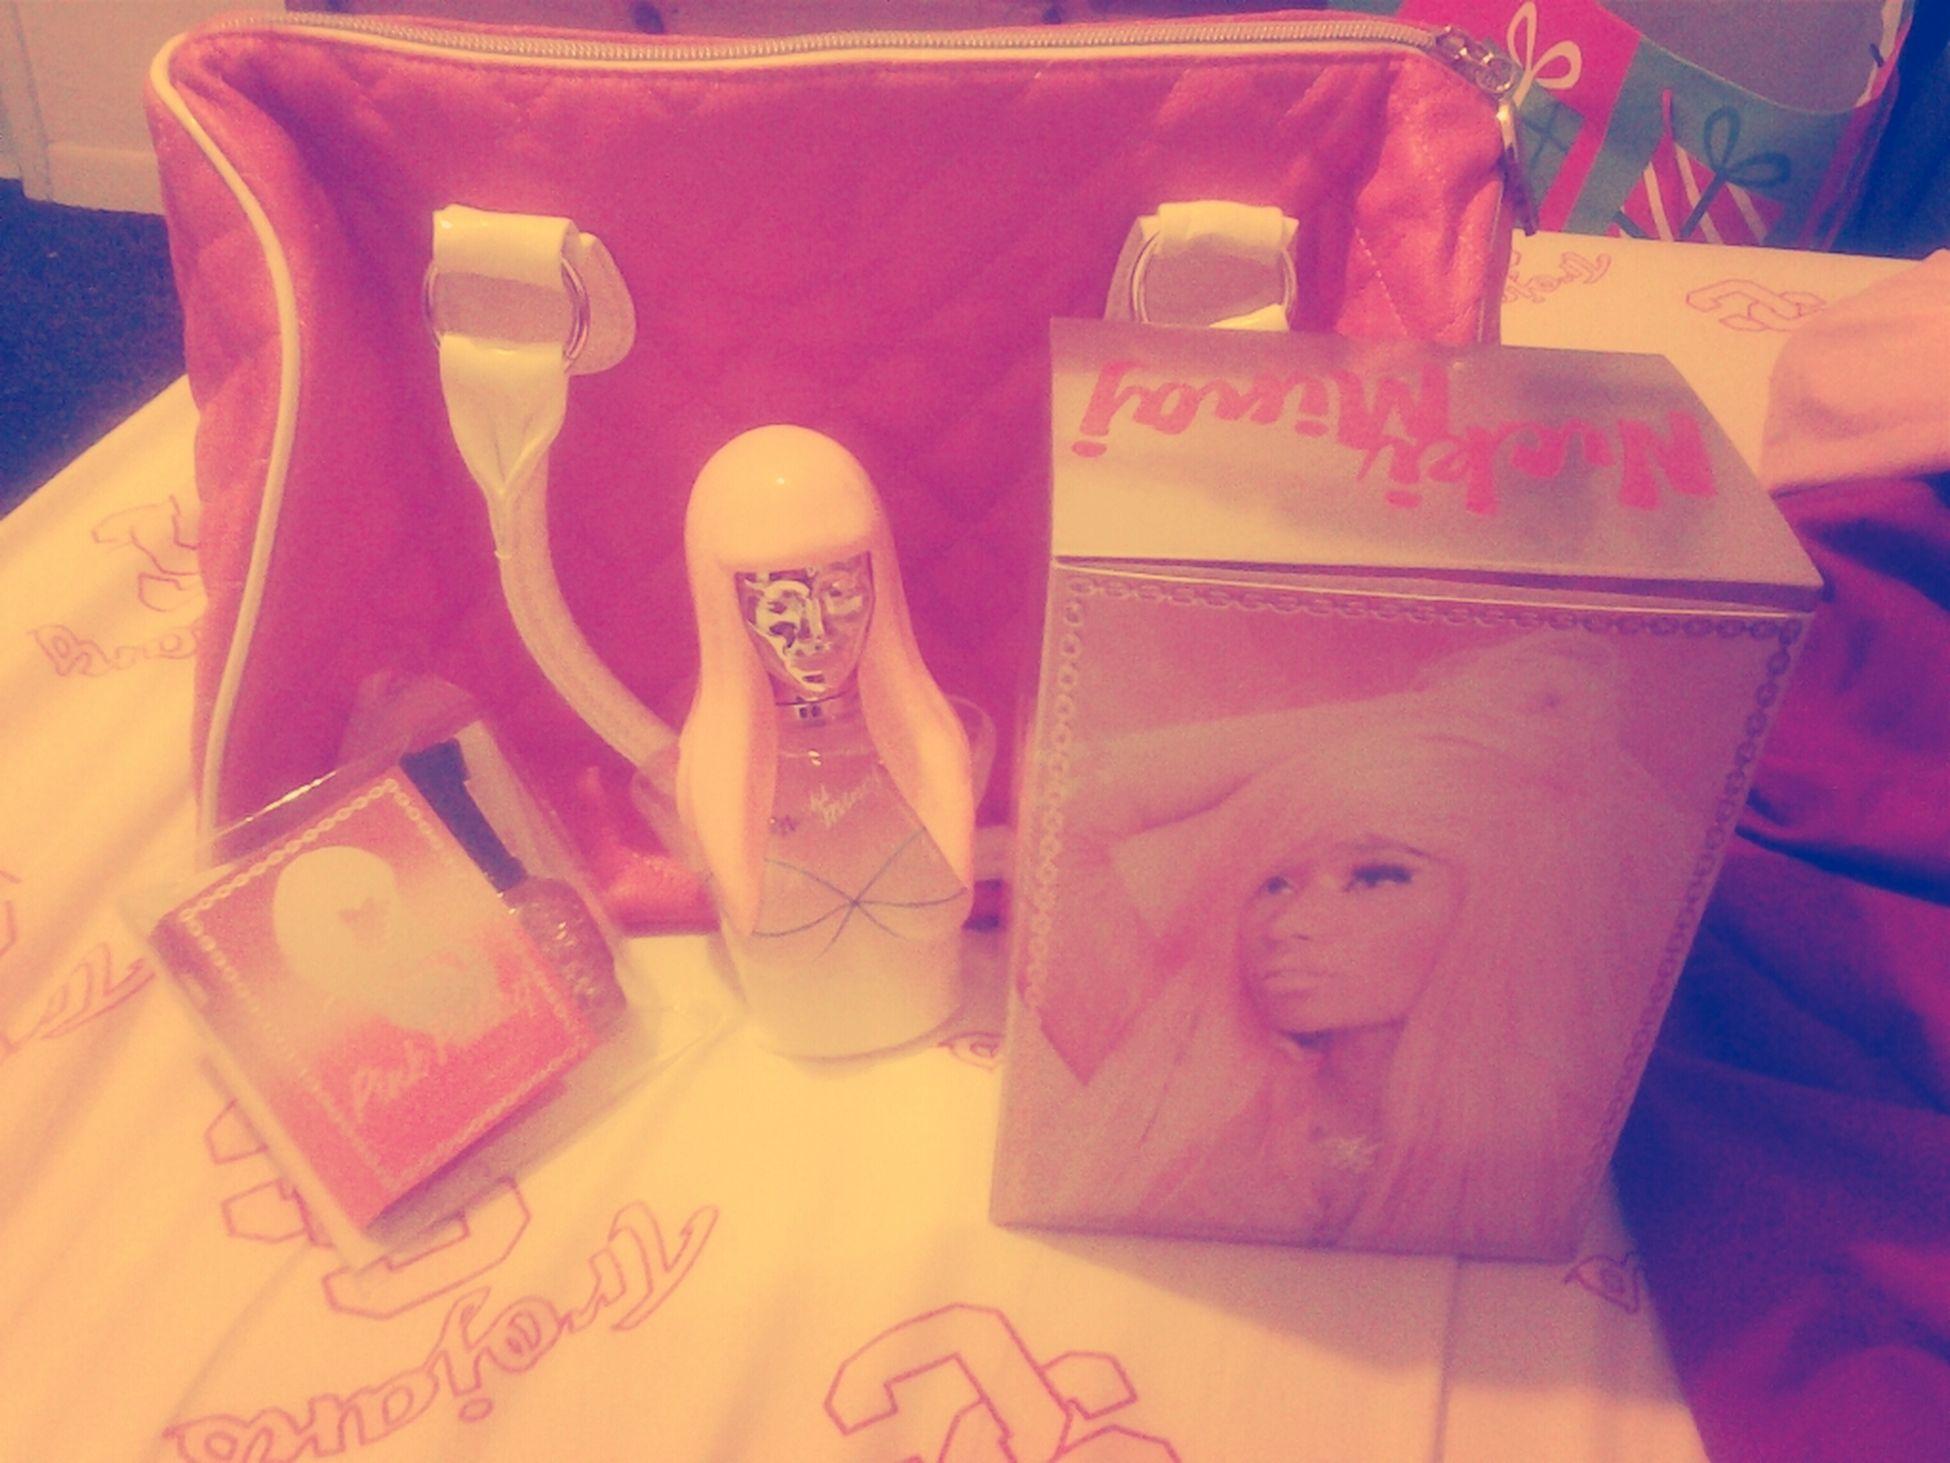 Christmas Present From My Boyfriend ♥